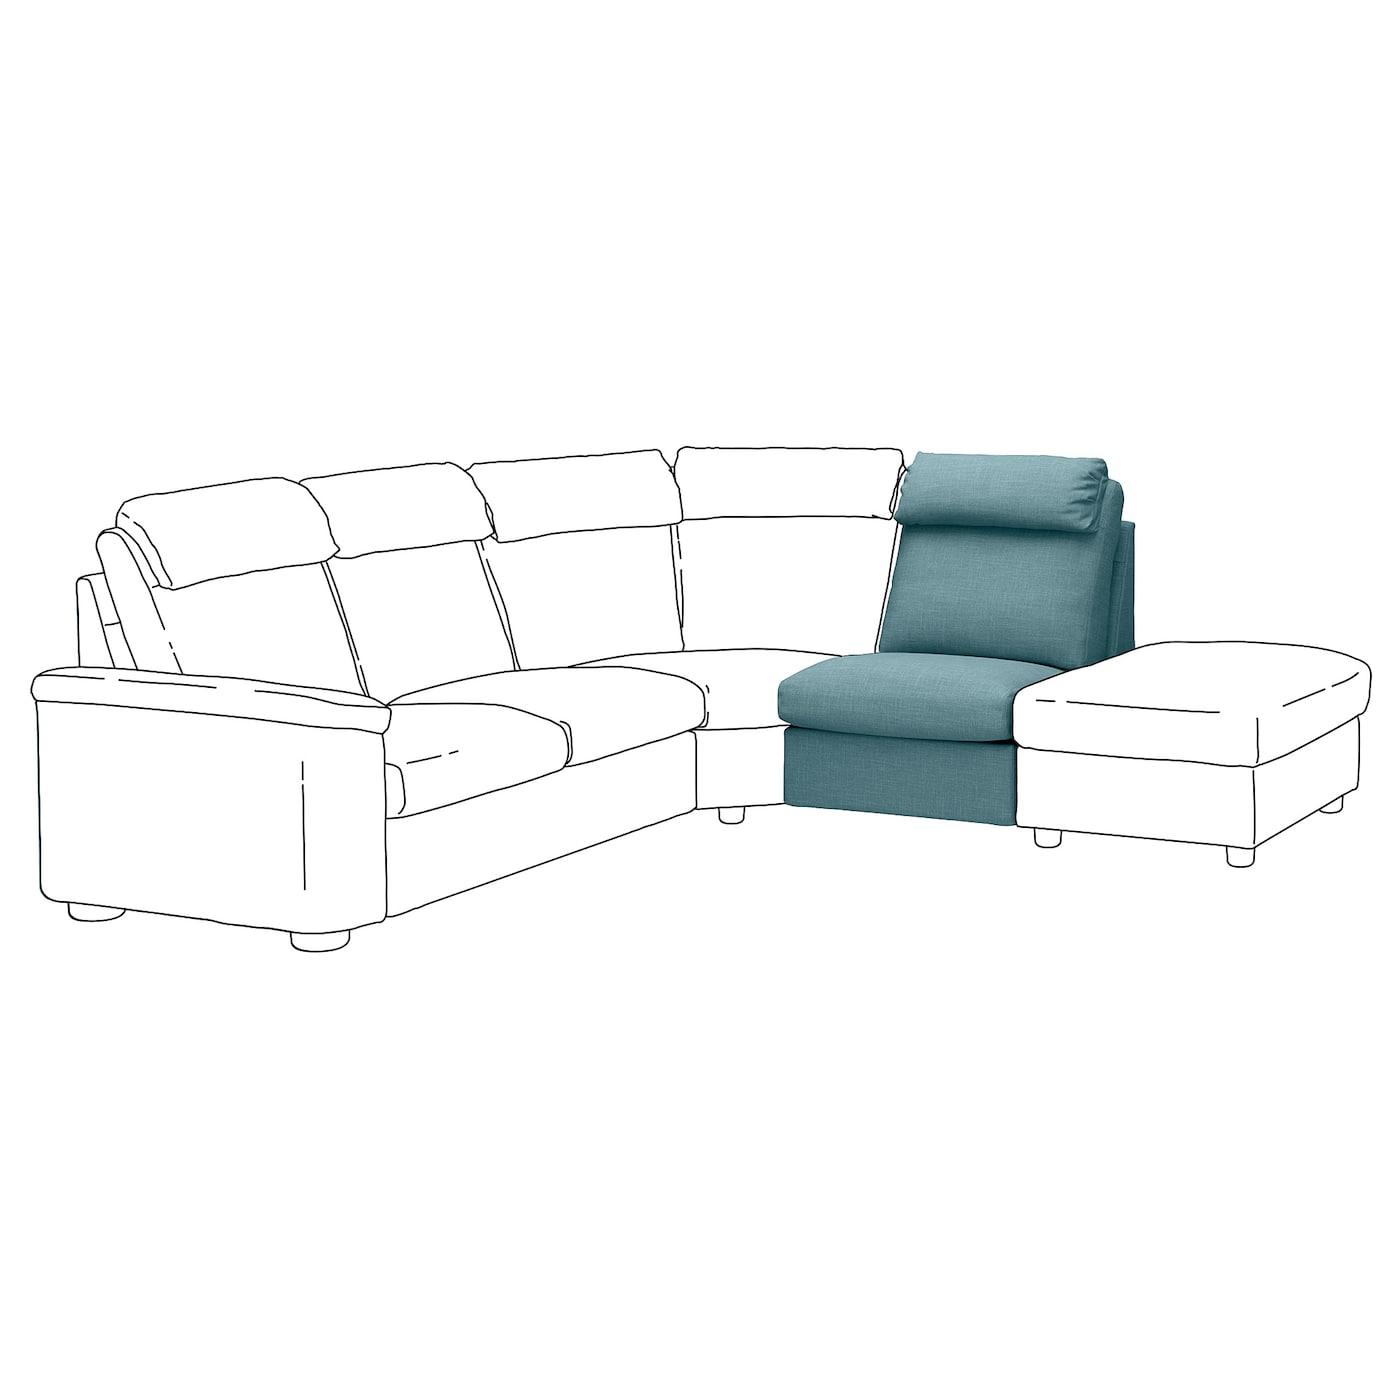 IKEA LIDHULT Sekcja 1-osobowa, Gassebol niebieski/szary